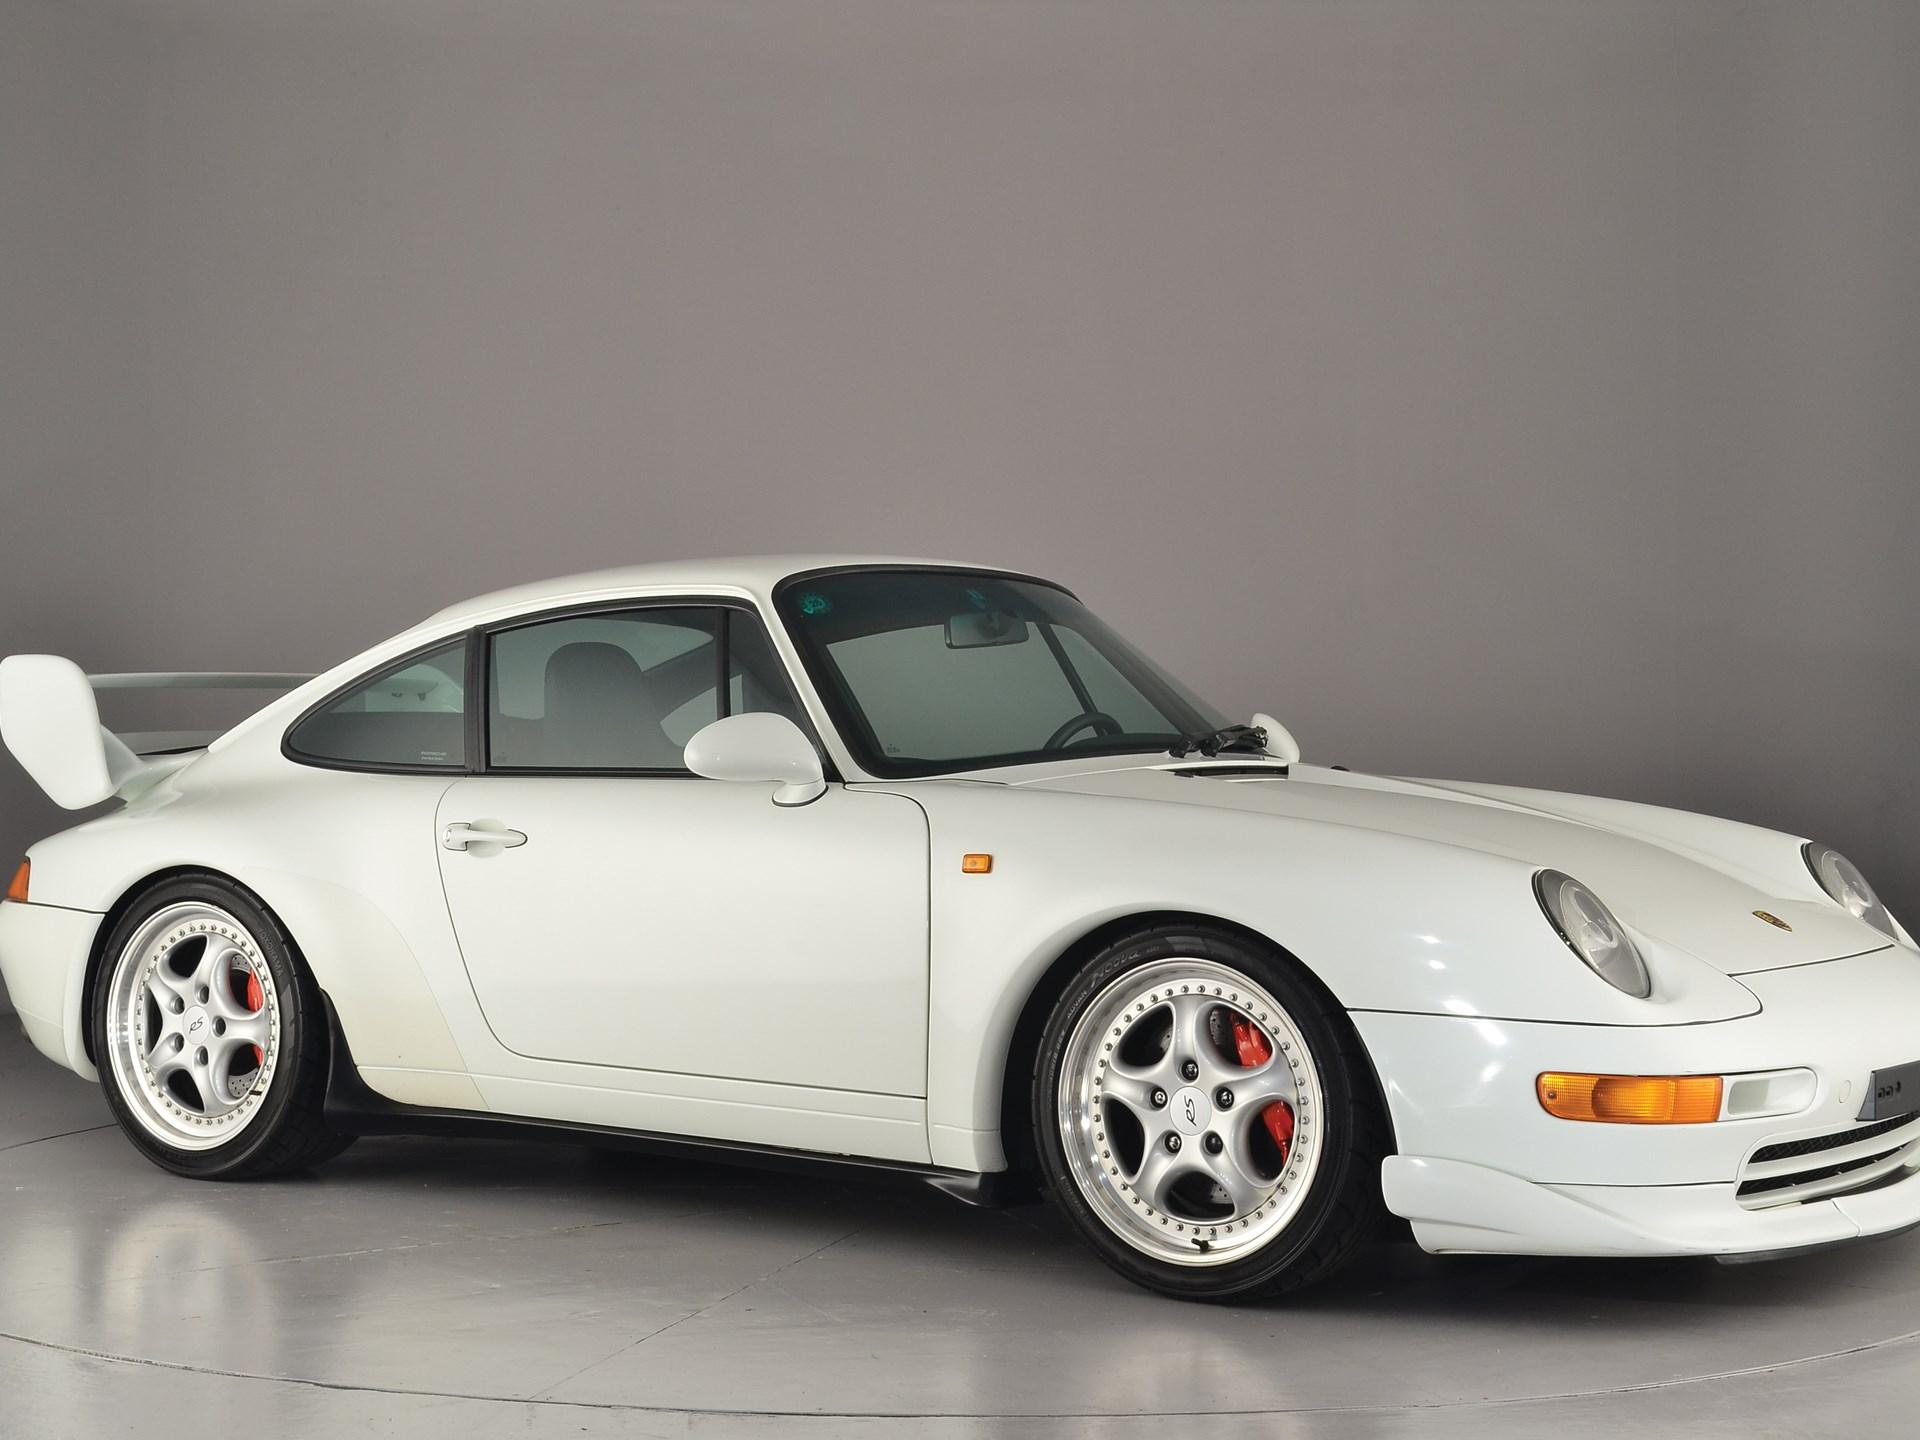 1996 Porsche 911 Carrera RS 3.8